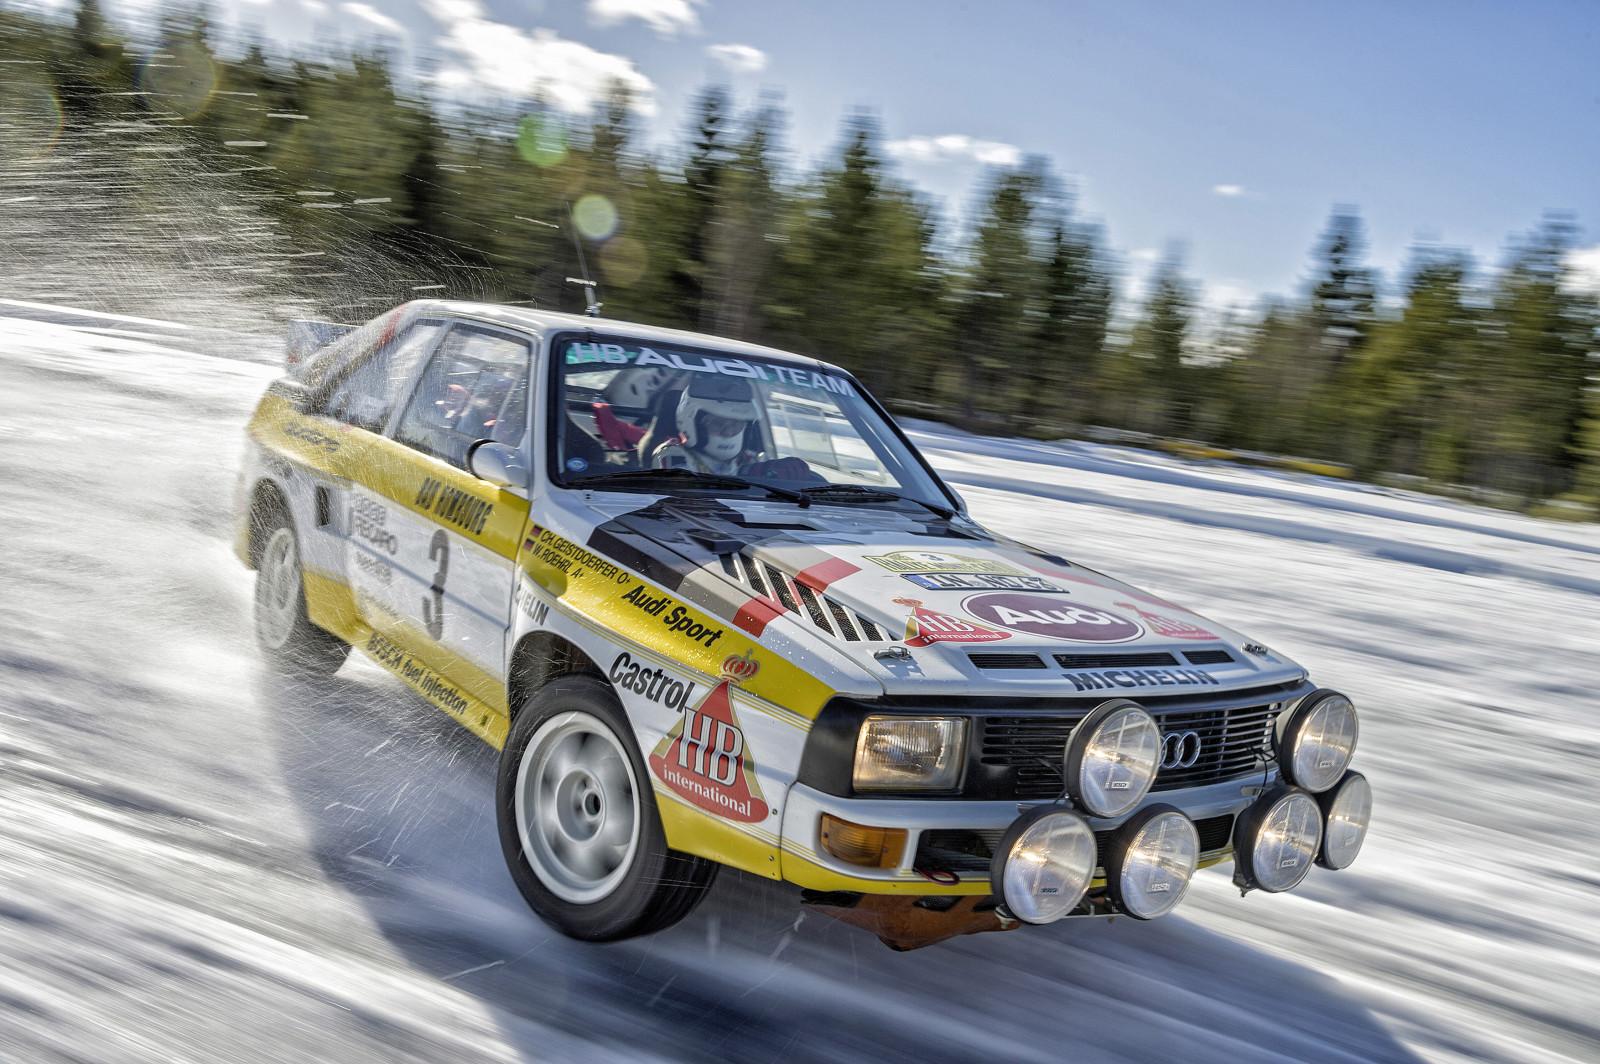 Wallpaper : snow, winter, vehicle, Audi, Quattro, sports ...